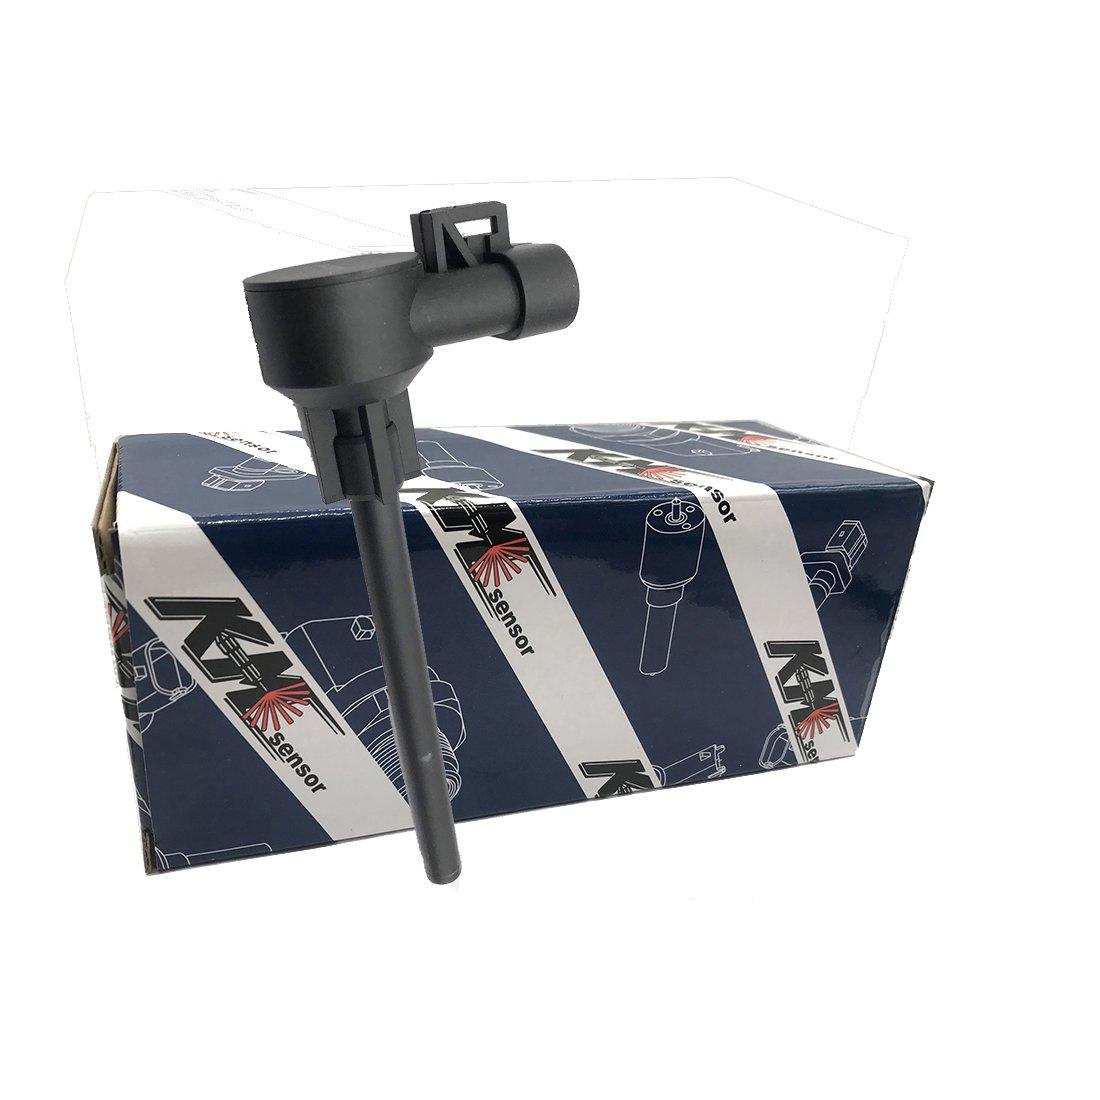 904-7631 Coolant Level Sensor N9267001 RP31640002 Fits For PETERBILT KENWORTH TRUCKS